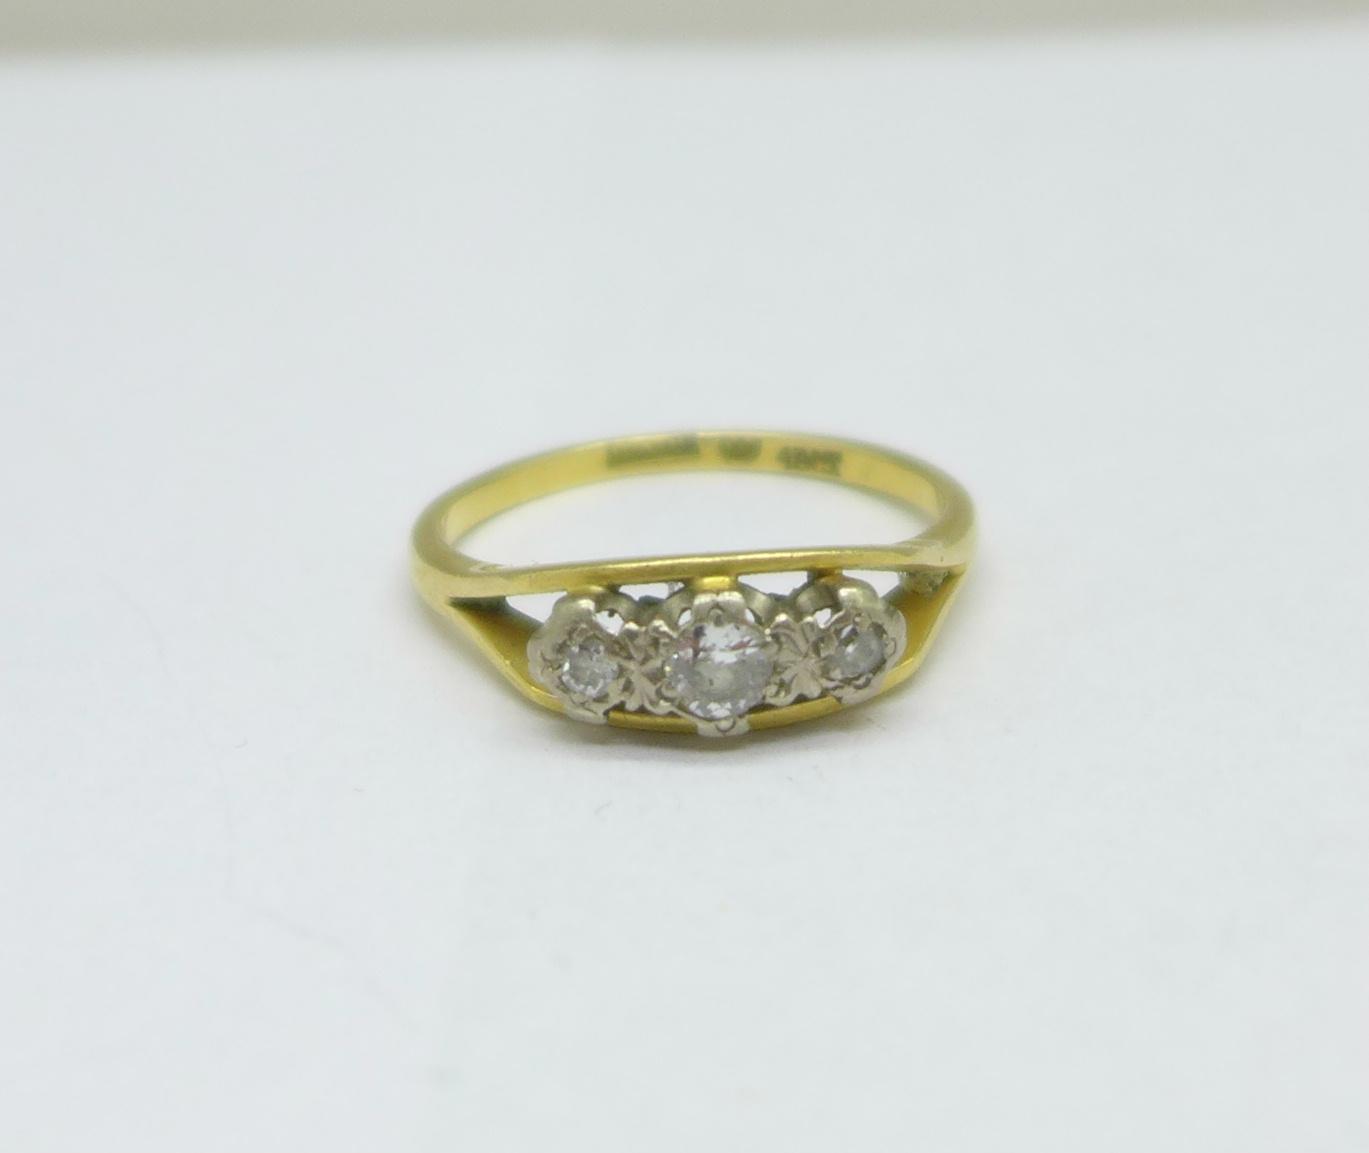 An 18ct gold and three stone diamond ring, 3.9g, Q